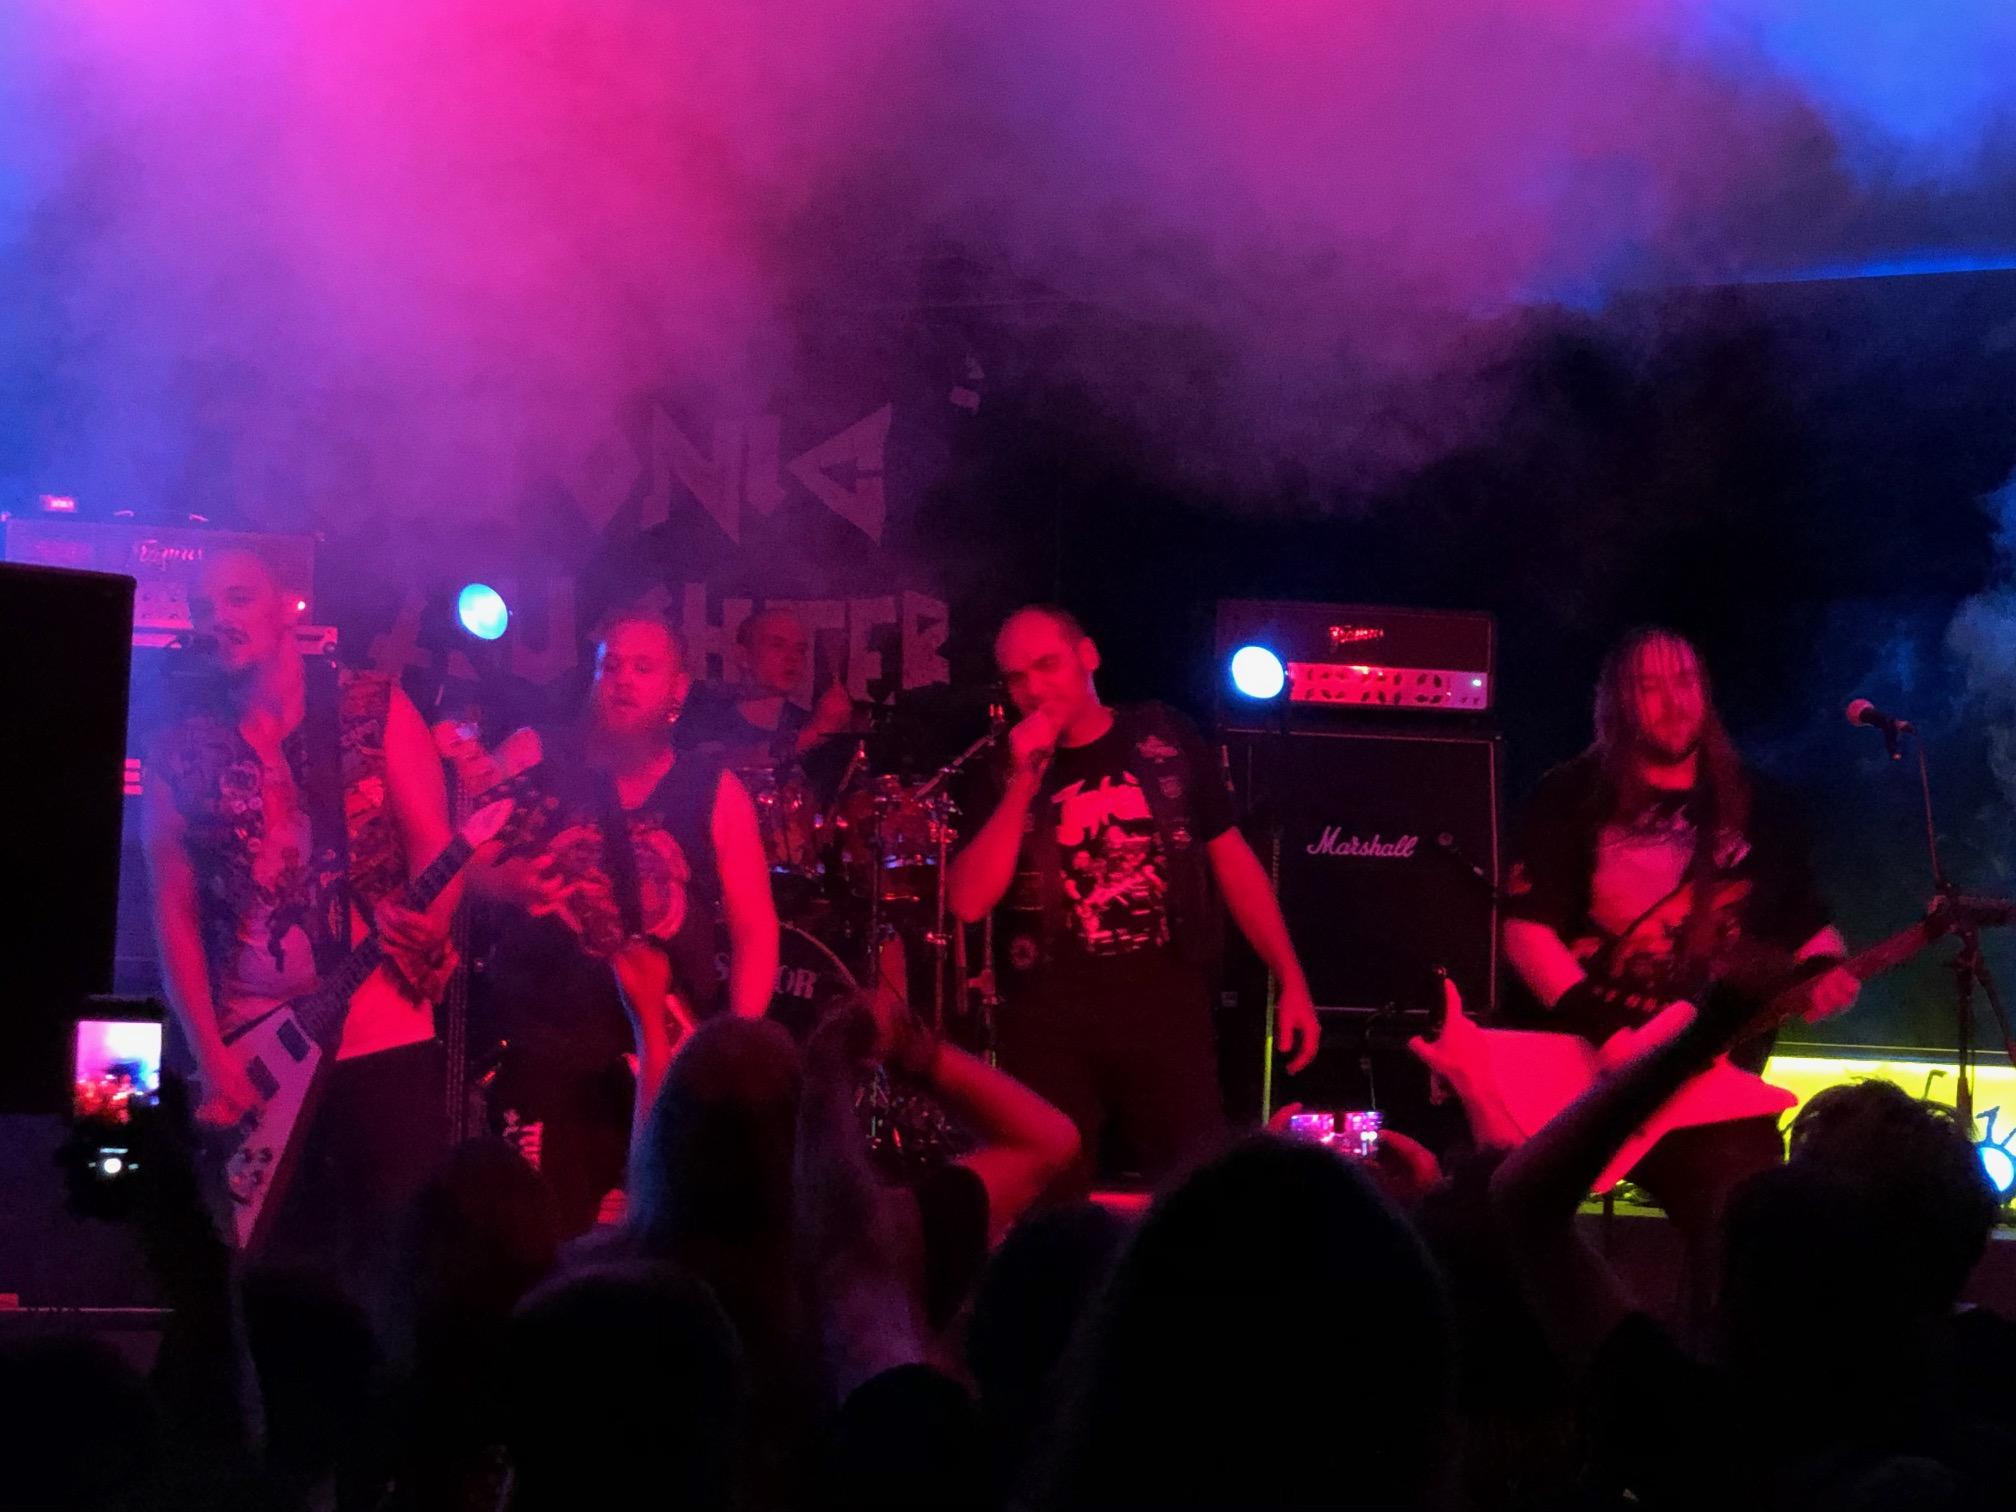 Teutonic Slaughter mit Lemmy